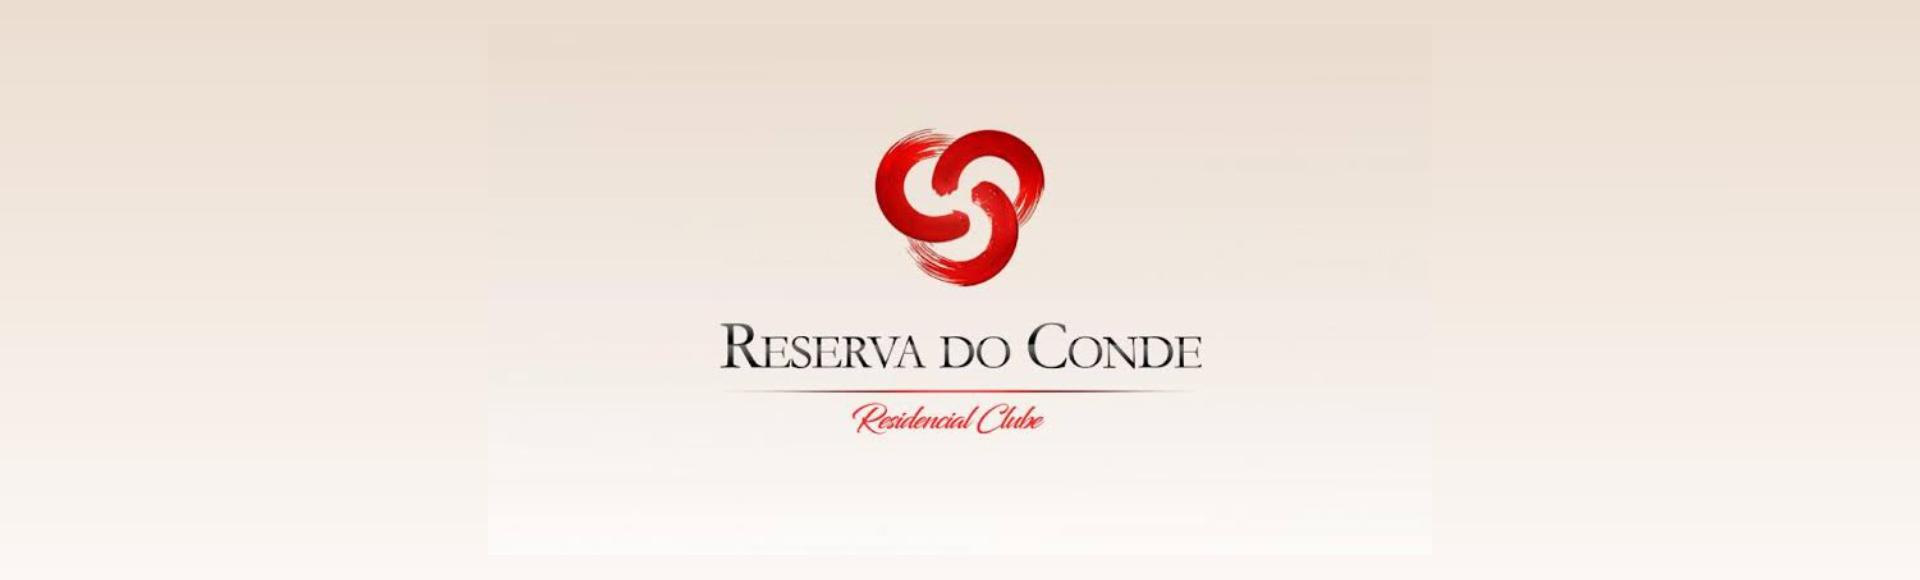 Reserva do Conde Tijuca